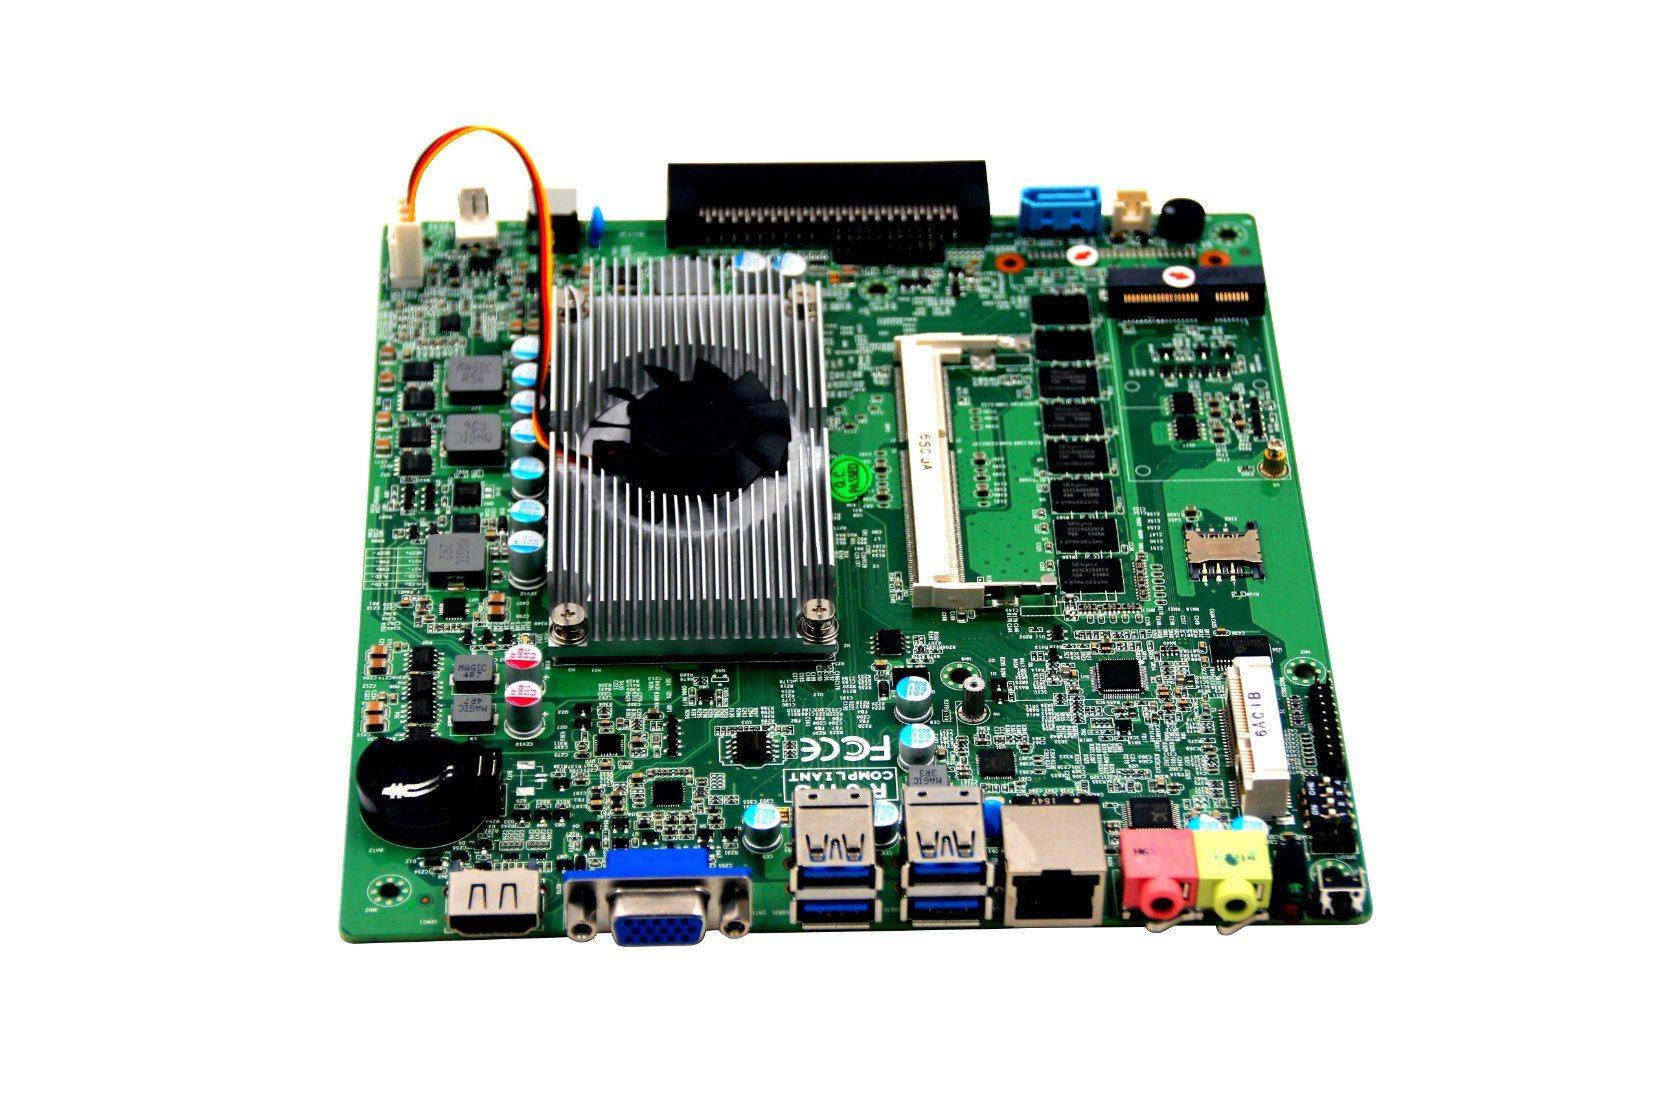 OEM Industrial OPS Computer Mini Itx Motherboard with I3-4010u Processor